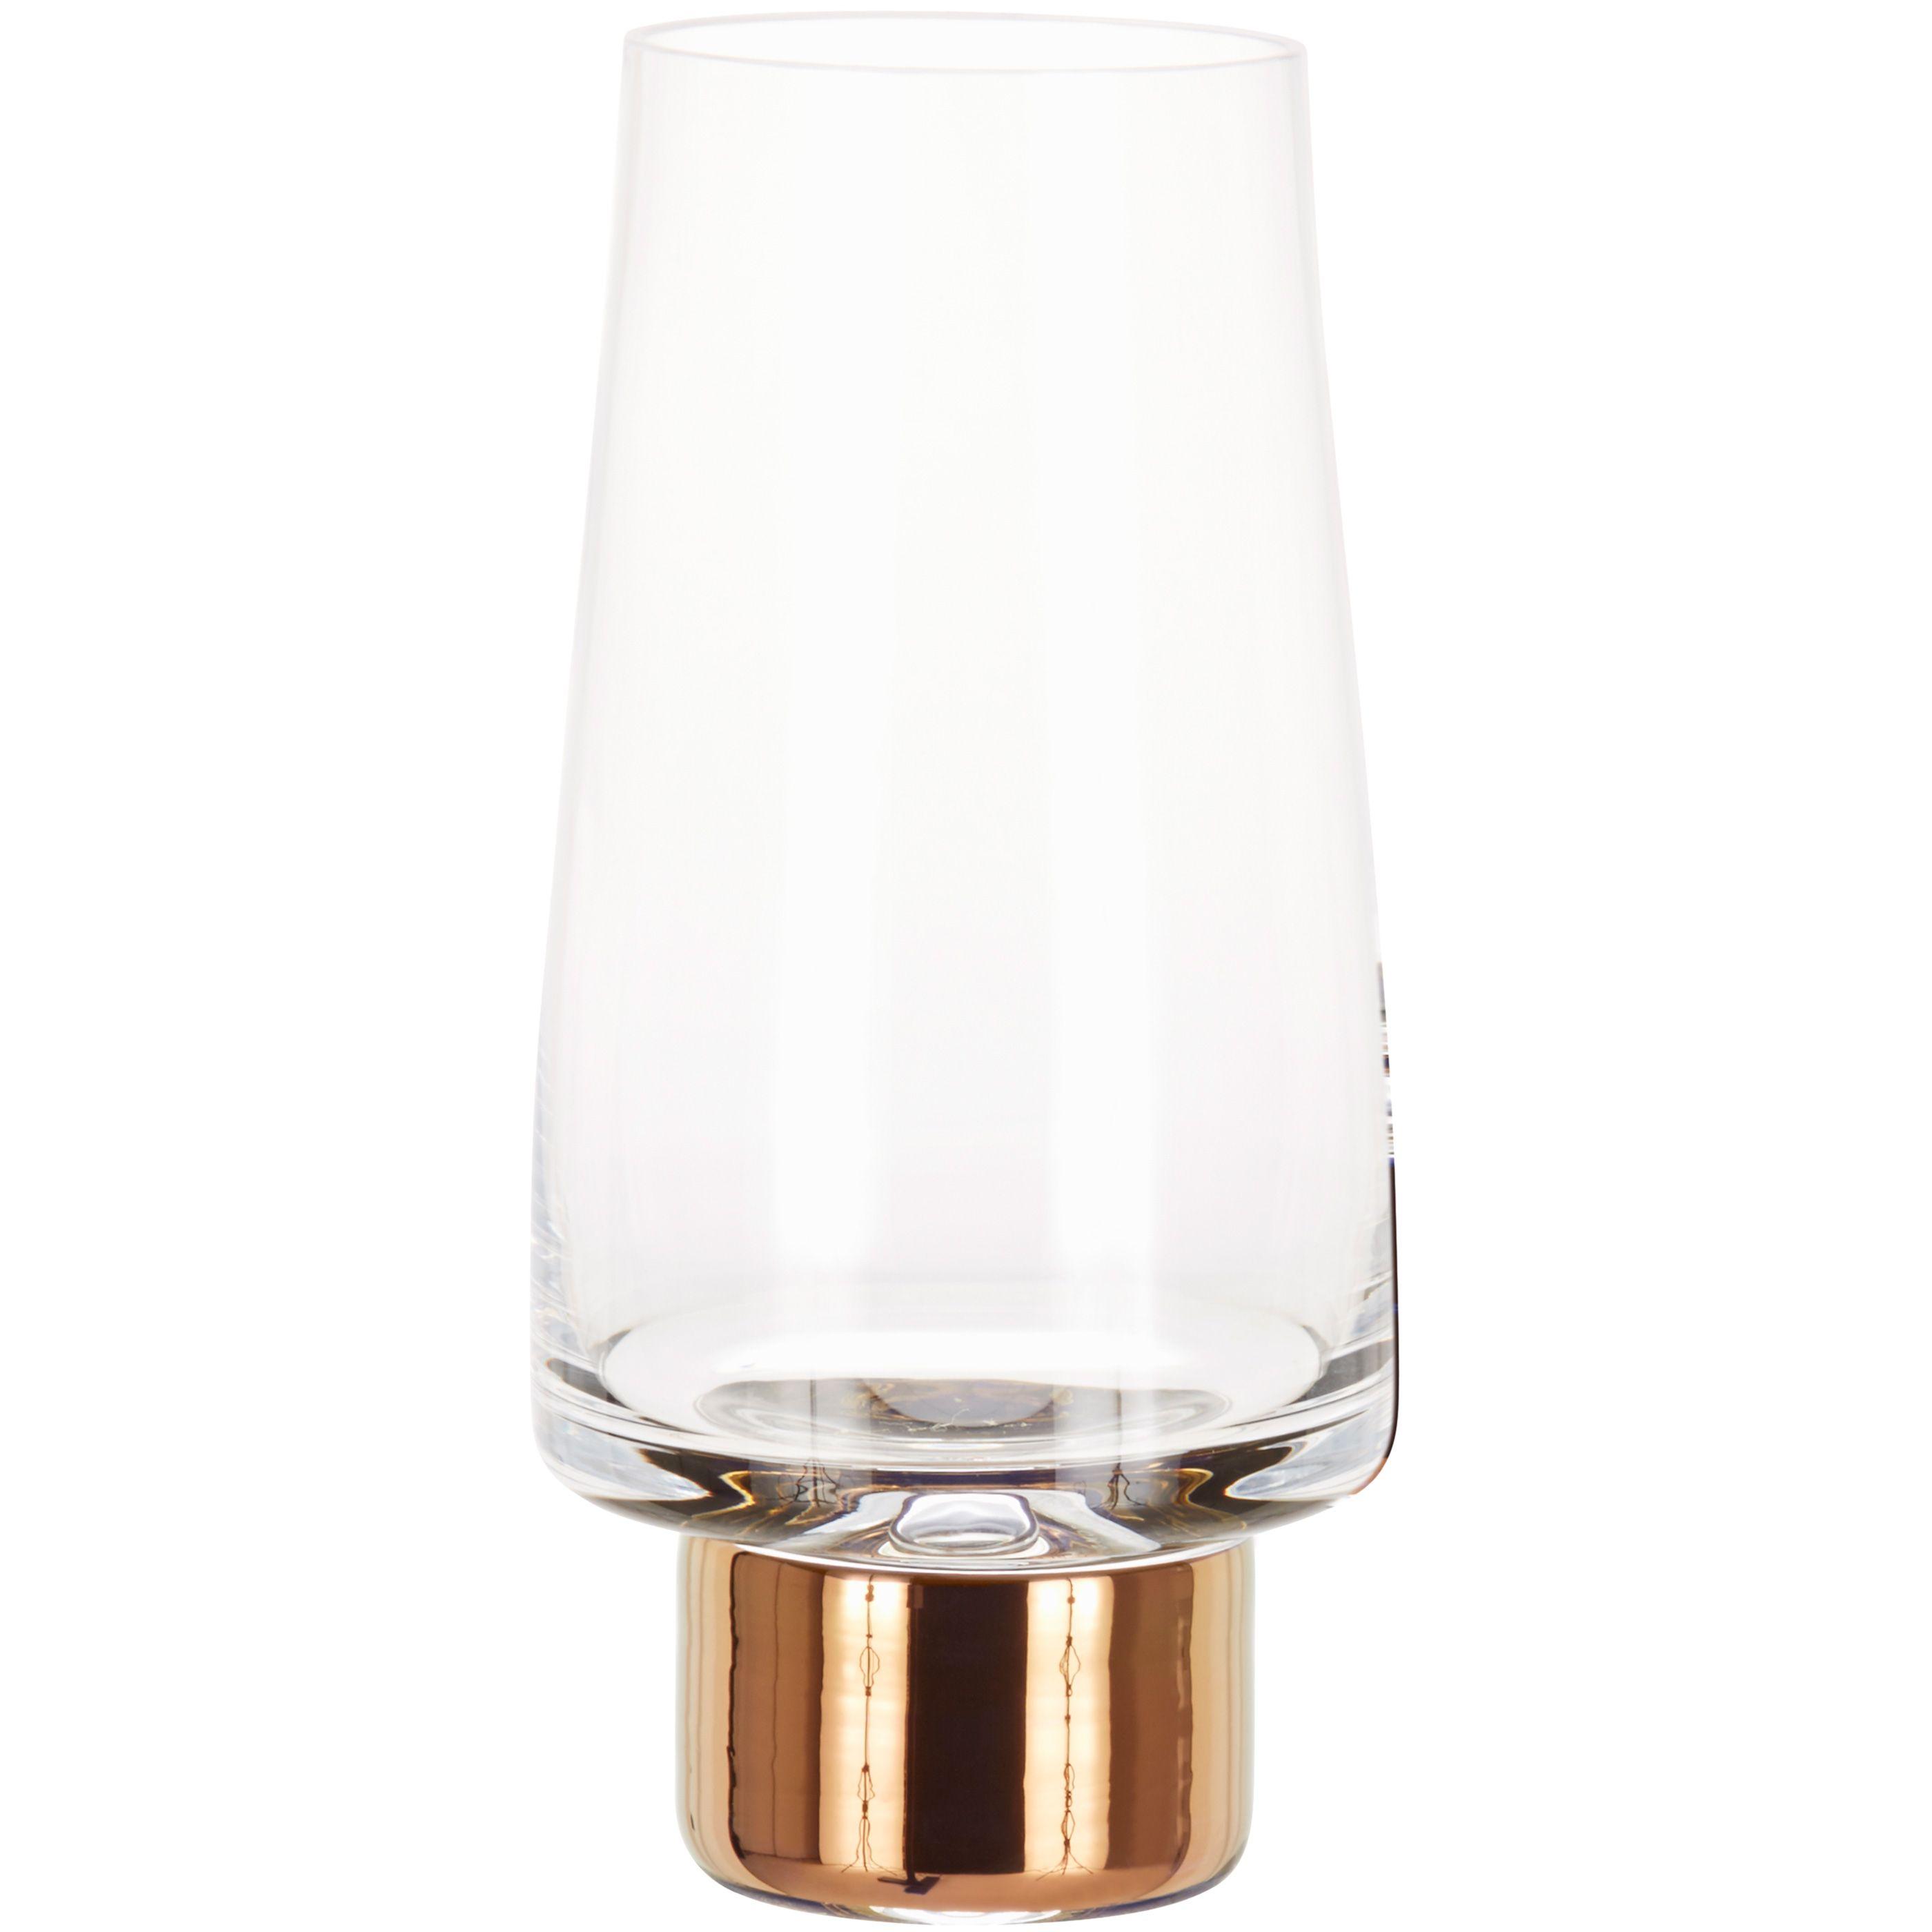 Tom Dixon Tank High Ball glas set van 2 kopen